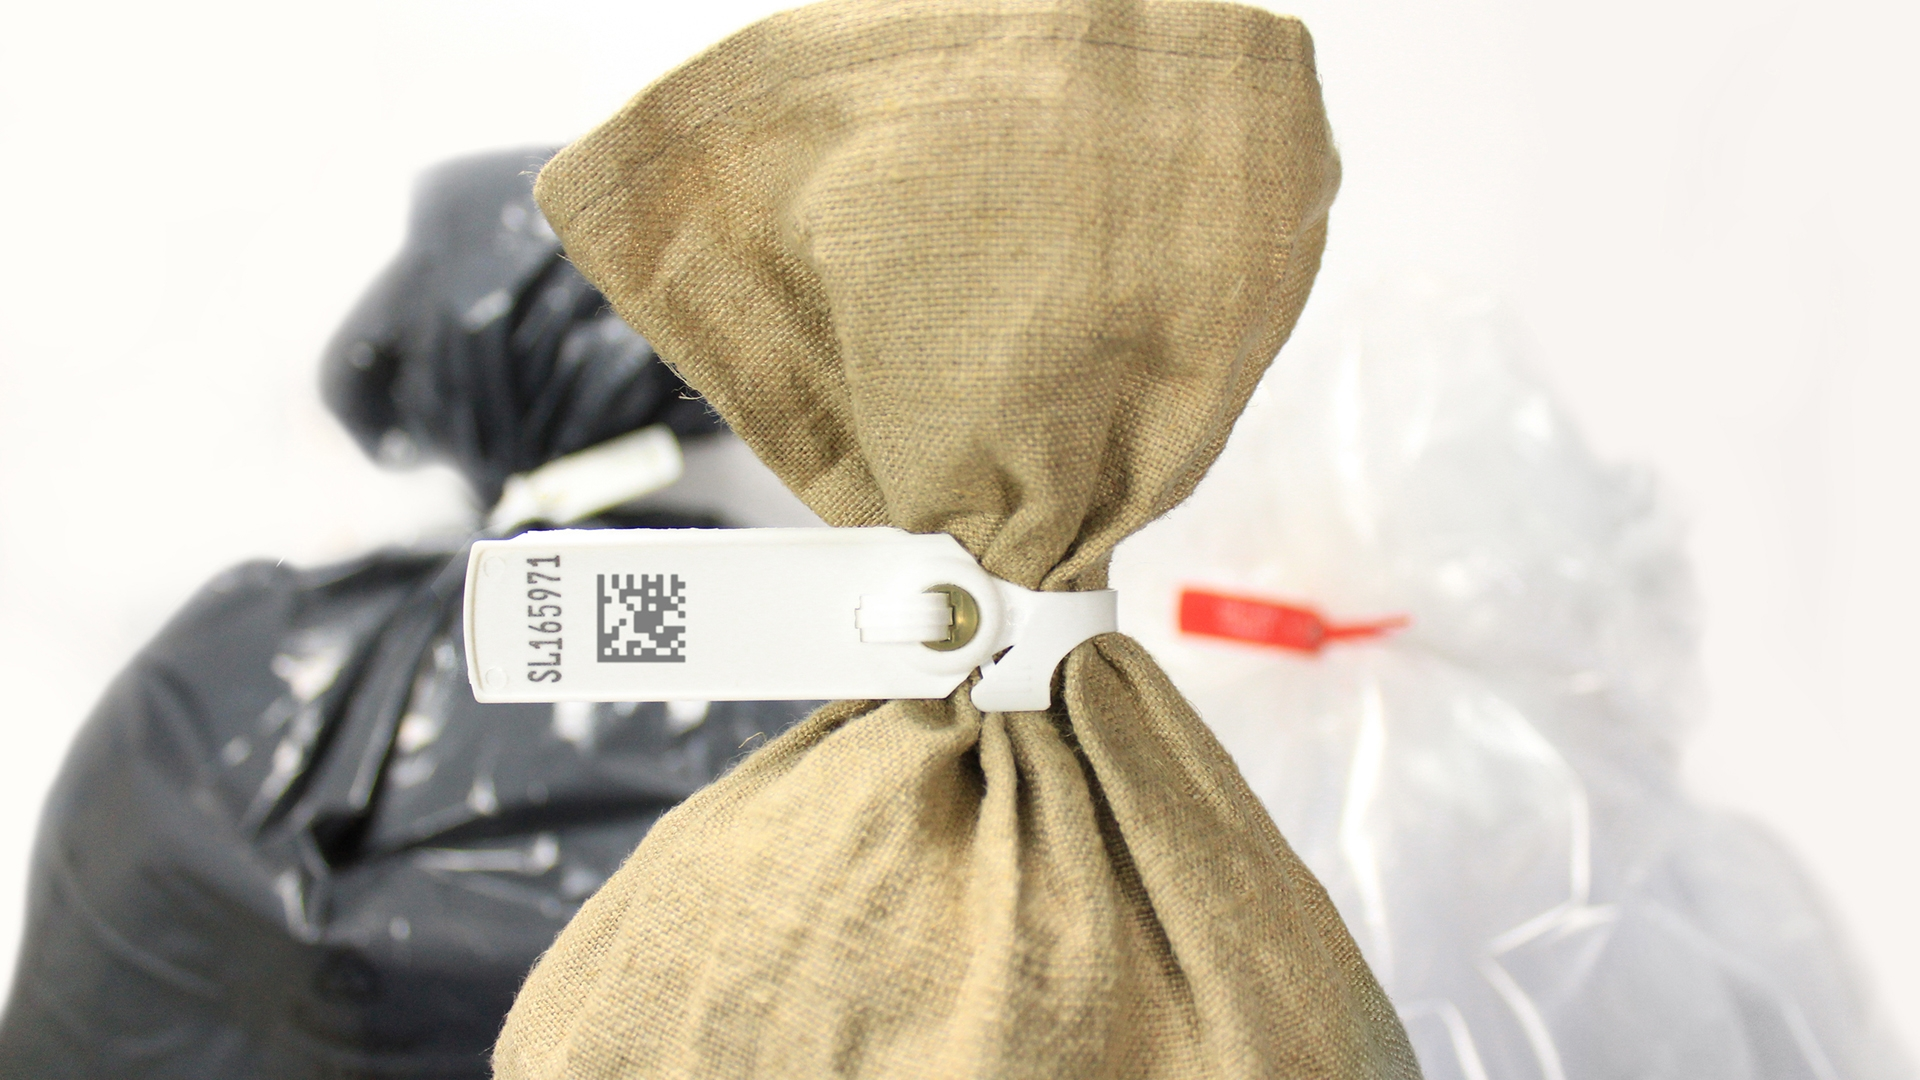 cash_bag_sl305a_anwendung_1920x1080.jpg